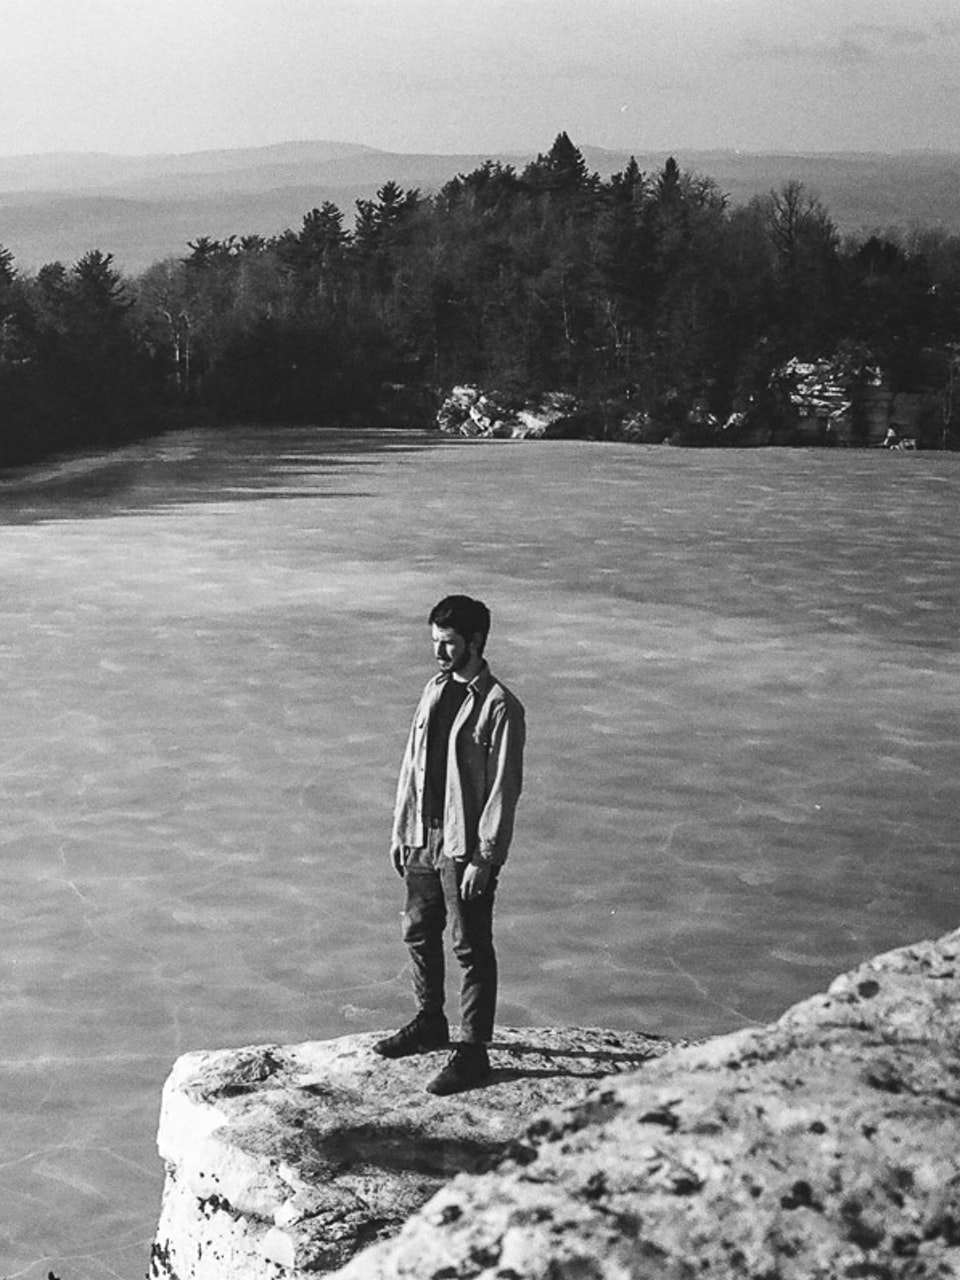 35mm Black and White Film - Lake Minnewaska, Rochester, NY